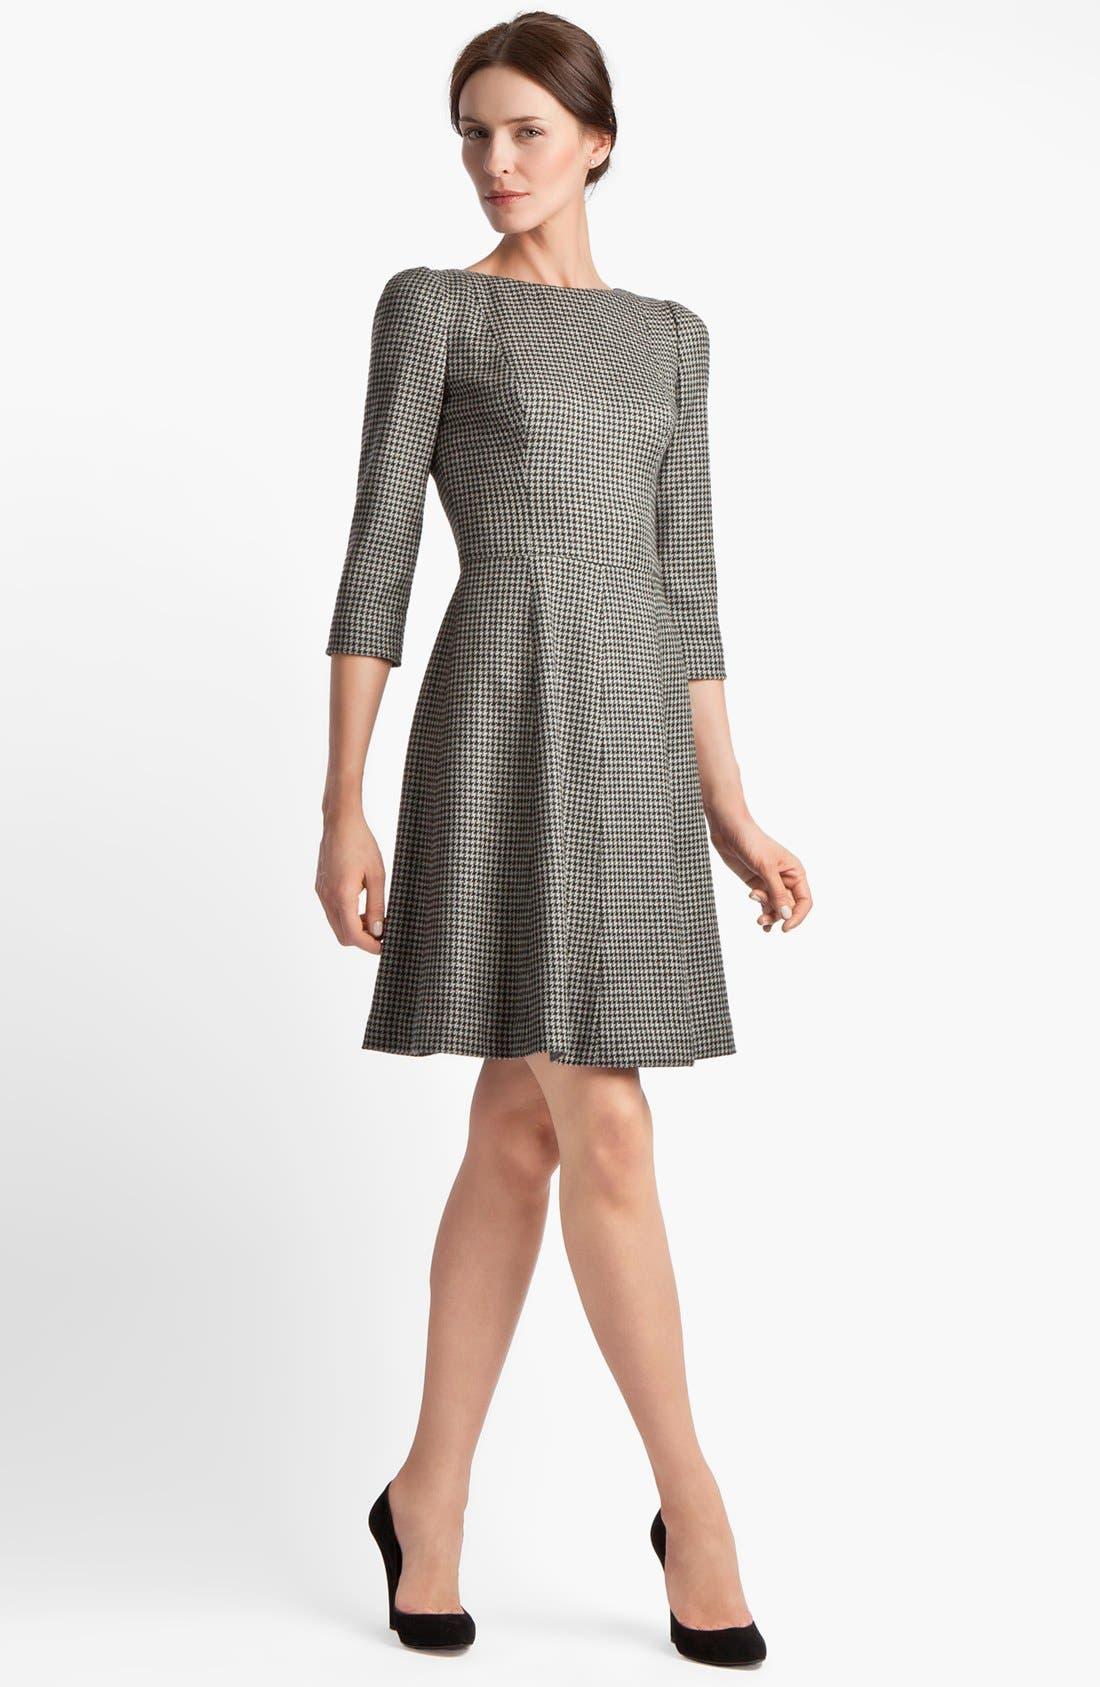 Alternate Image 1 Selected - Dolce&Gabbana Stretch Houndstooth Dress